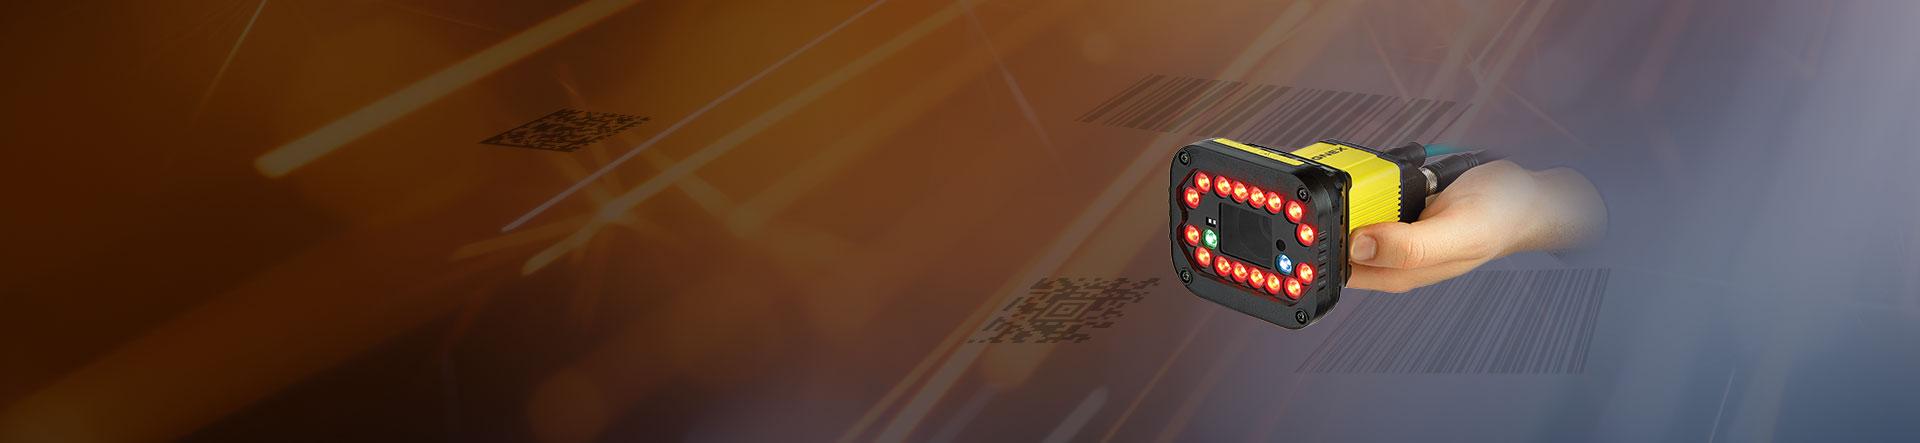 DataMan 370 Series Fixed-Mount Barcode Reader